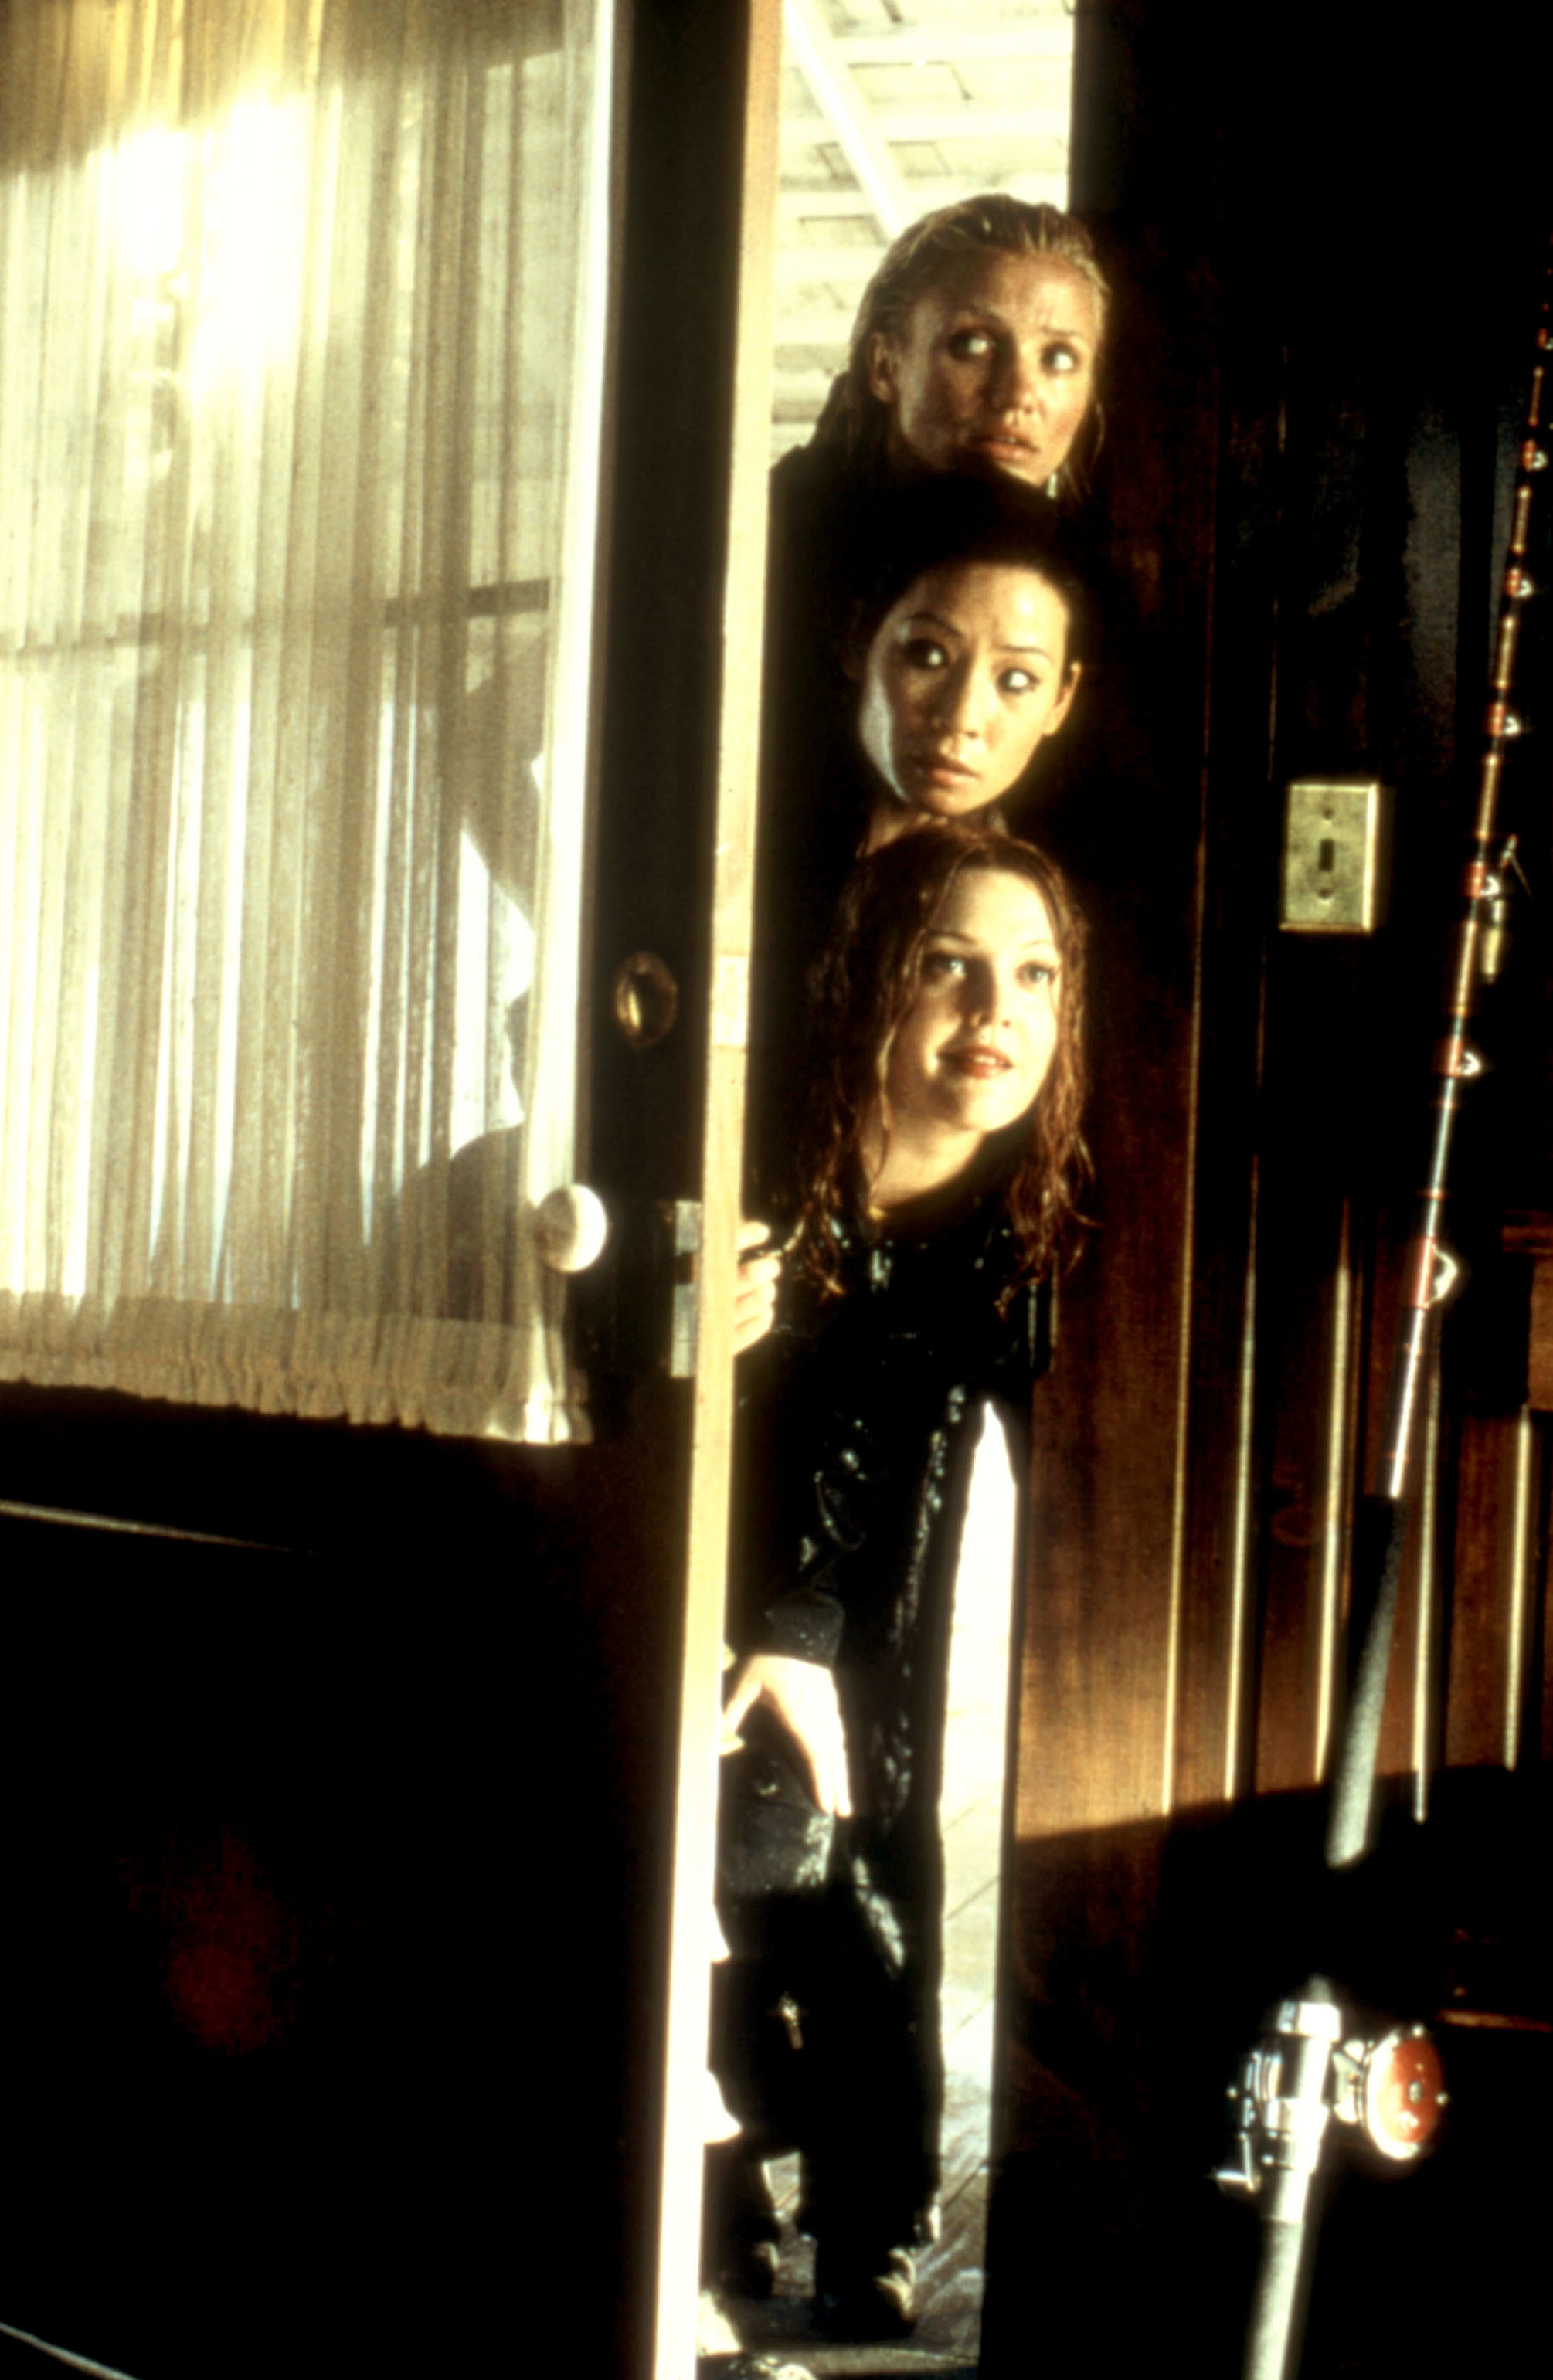 Barrymore, Liu, and Diaz break into a door in Charlie's Angels